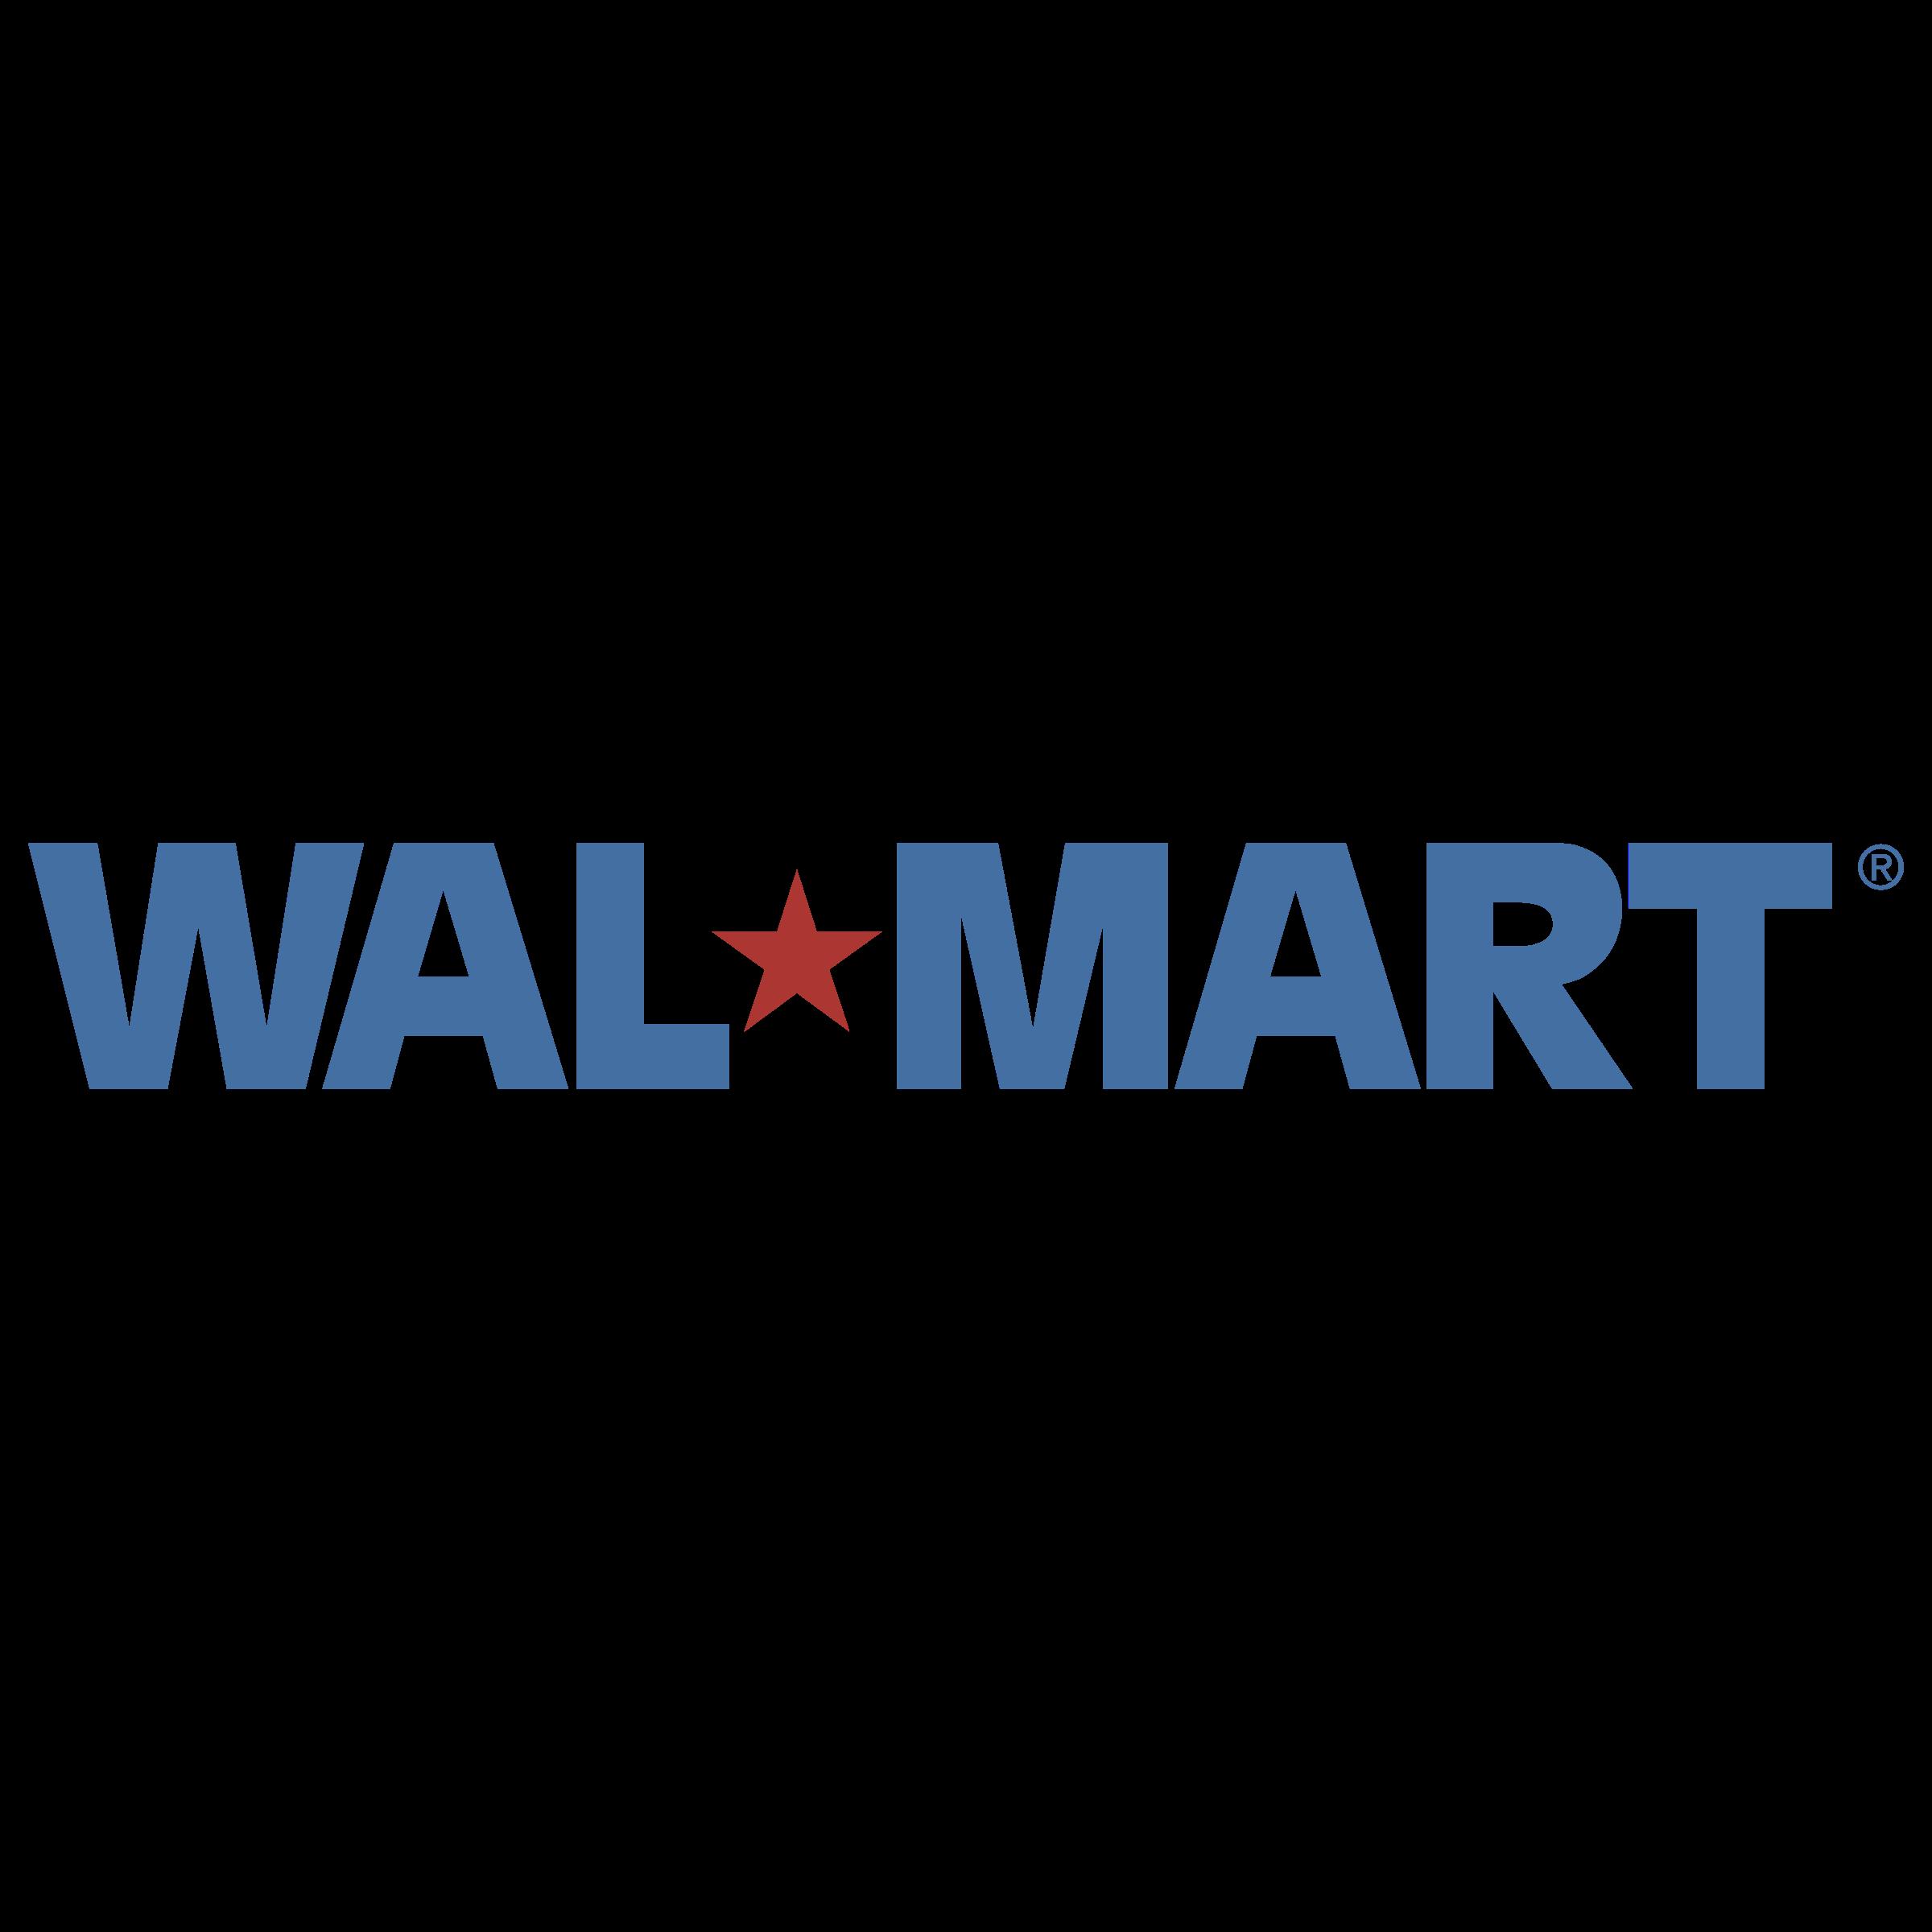 Wal Mart Logo PNG Transparent & SVG Vector - Freebie Supply